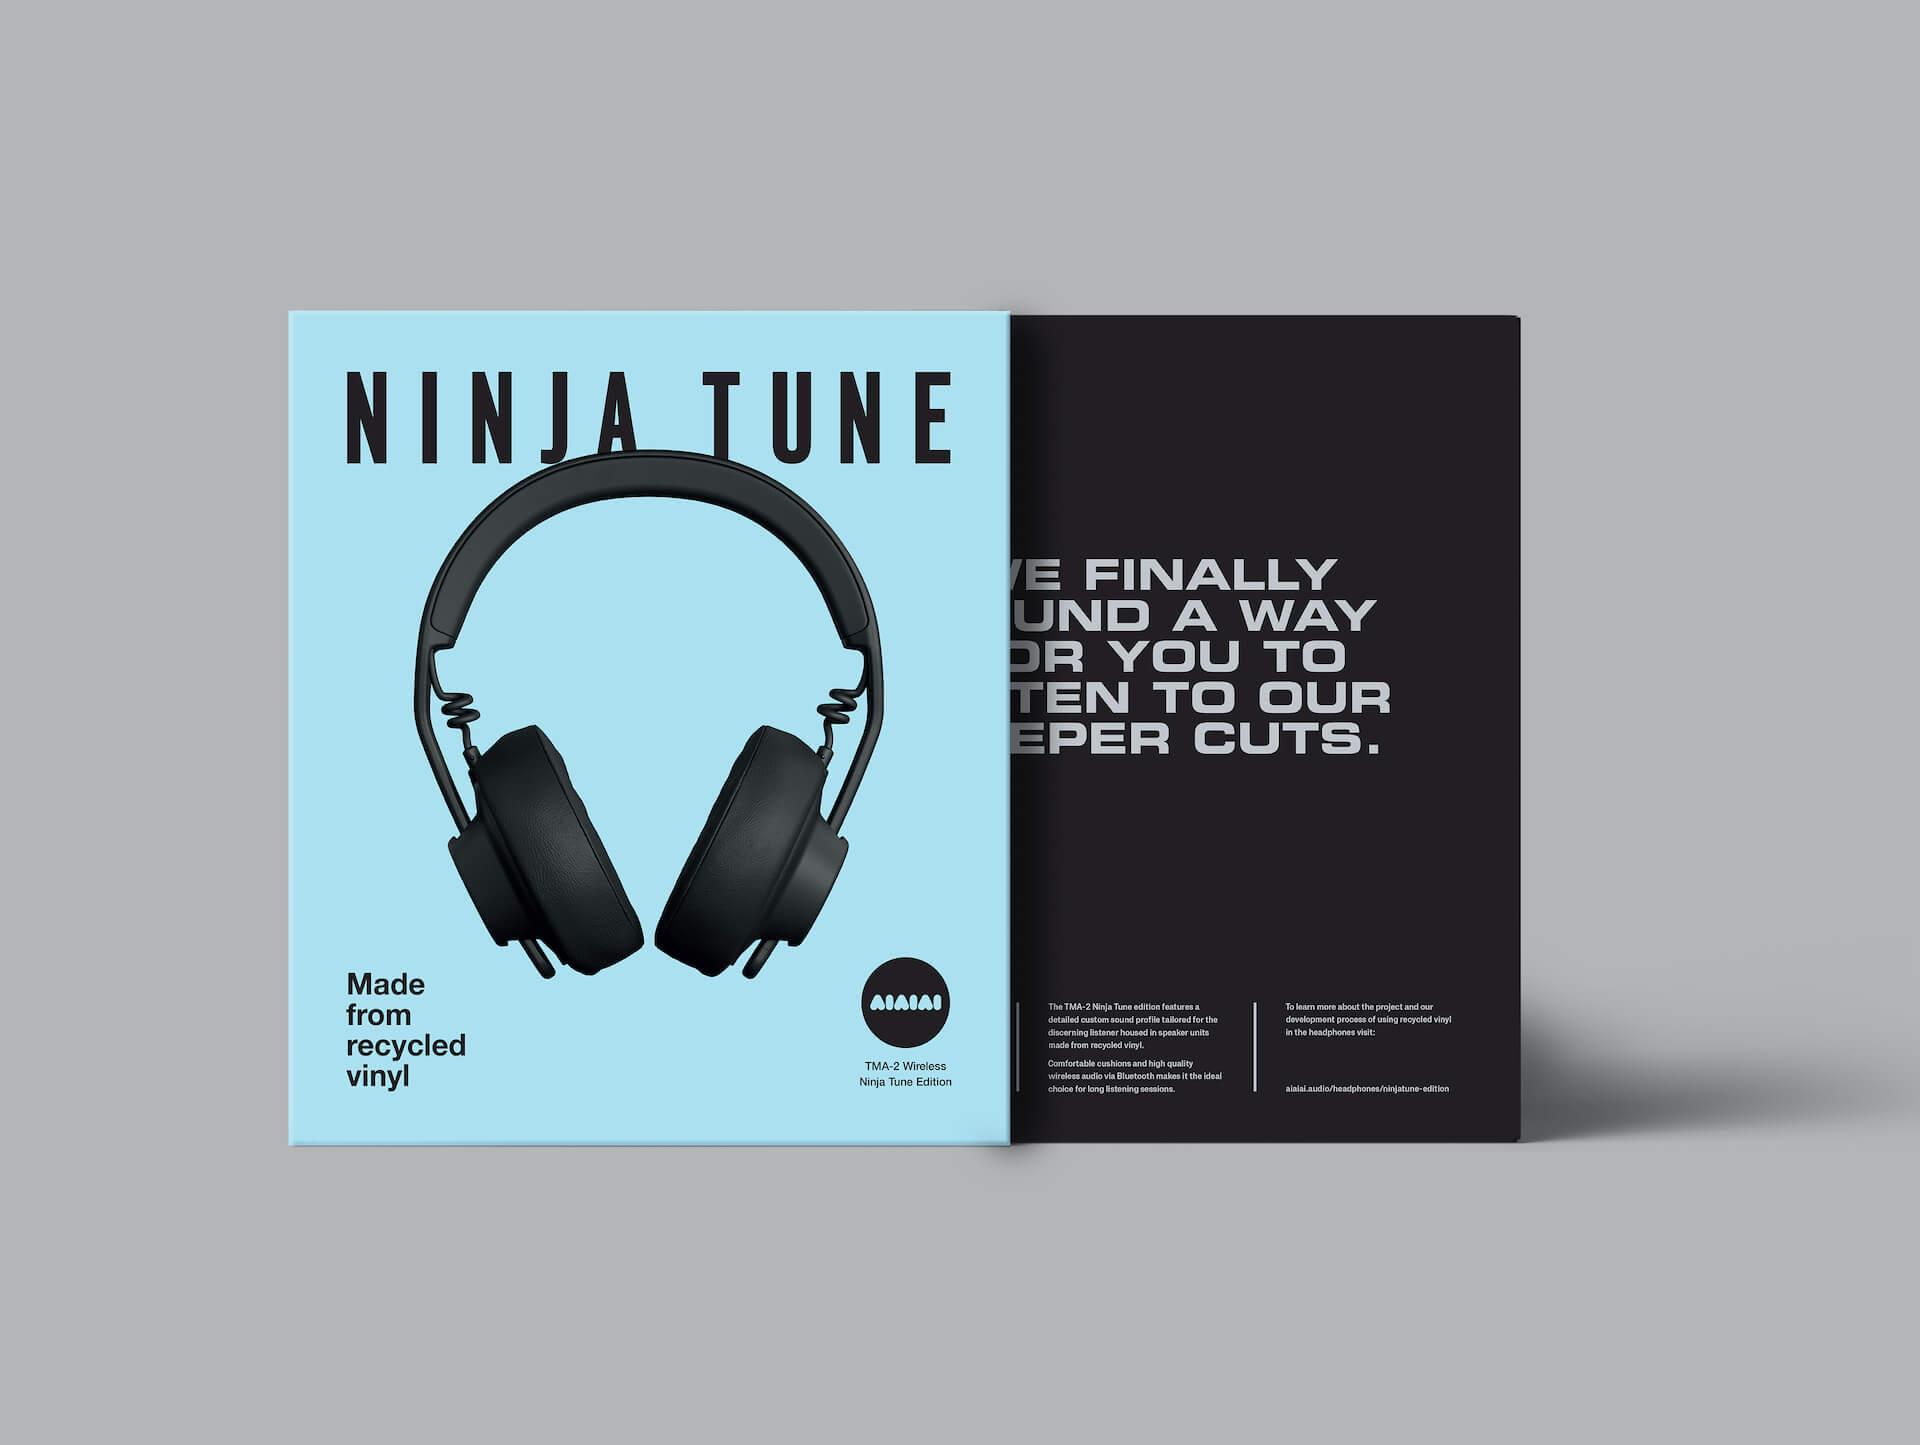 〈Ninja Tune〉とAiAiAiのコラボヘッドホン「TMA-2 Ninja Tune Edition」が本日発売! tech210618_ninjatune_aiaiai_4